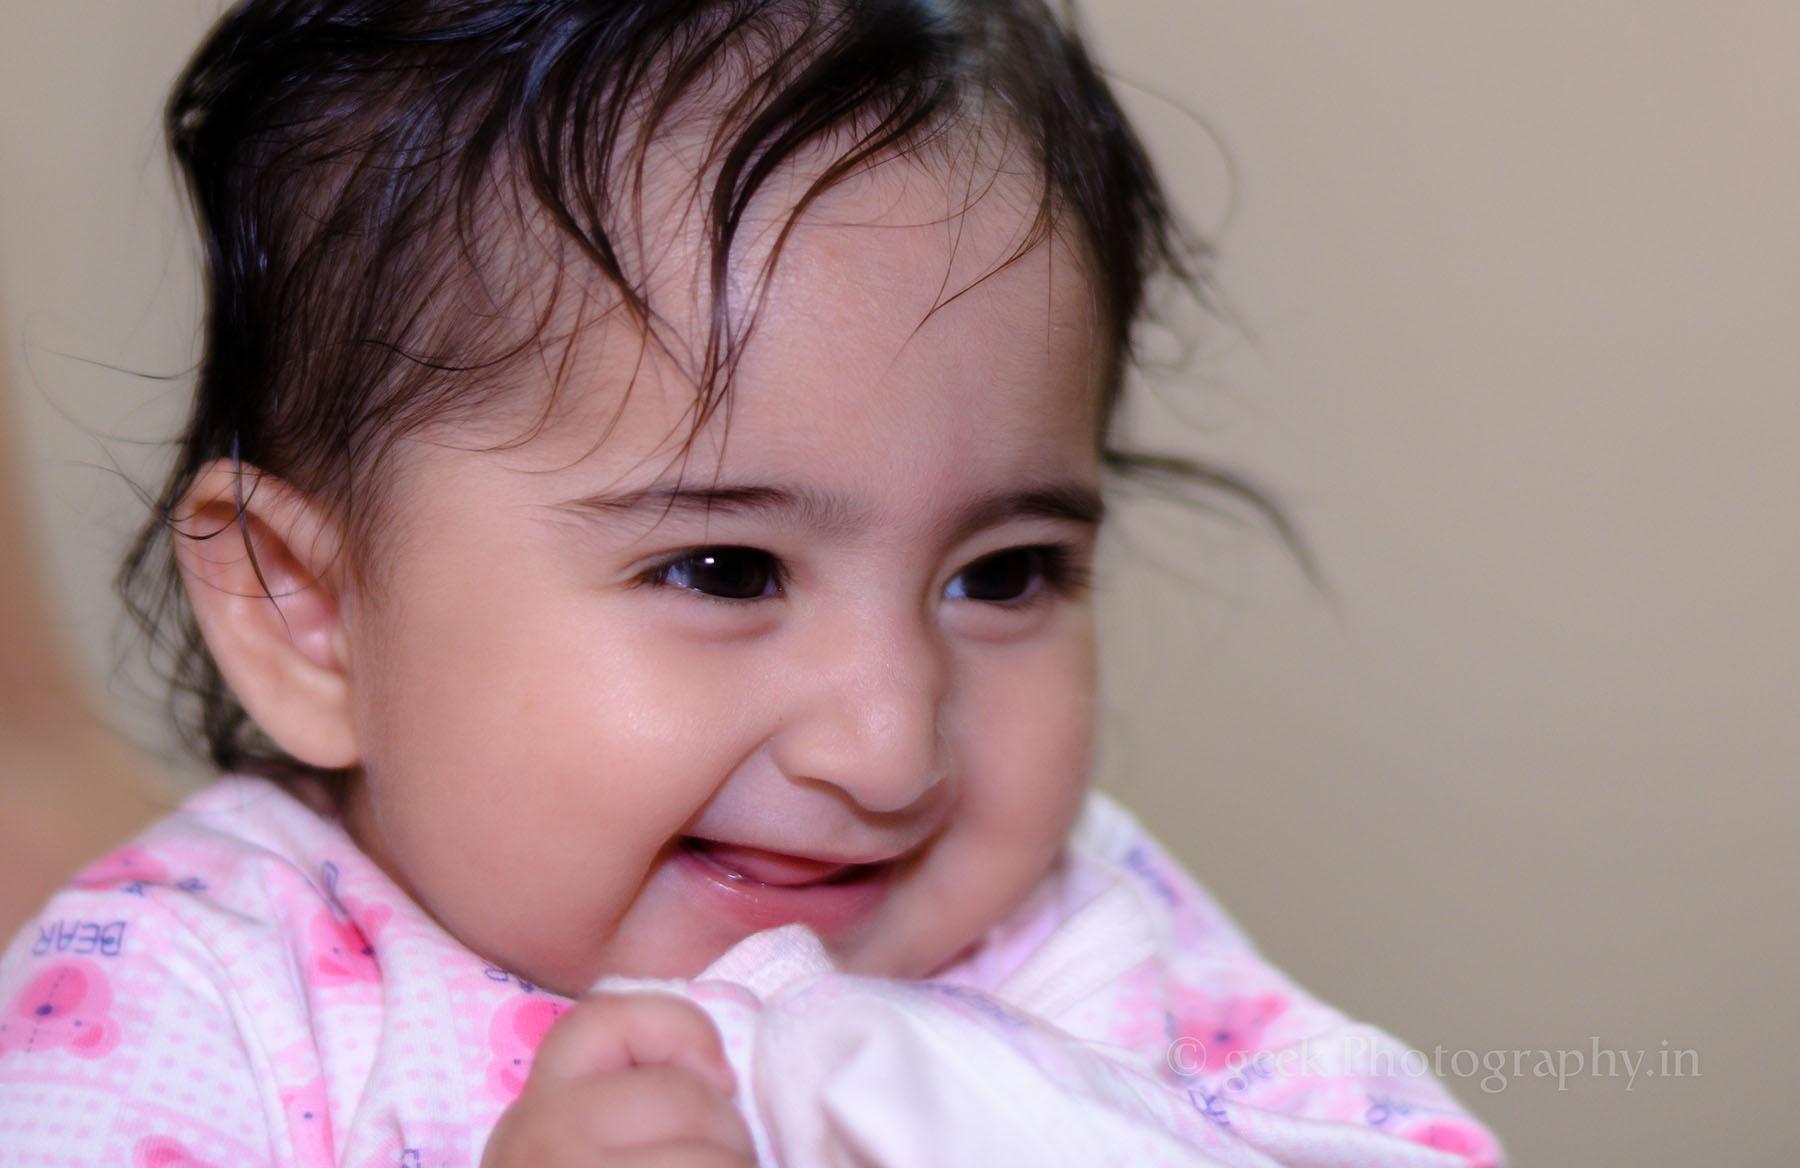 Sweet Indian Baby girl Portrait